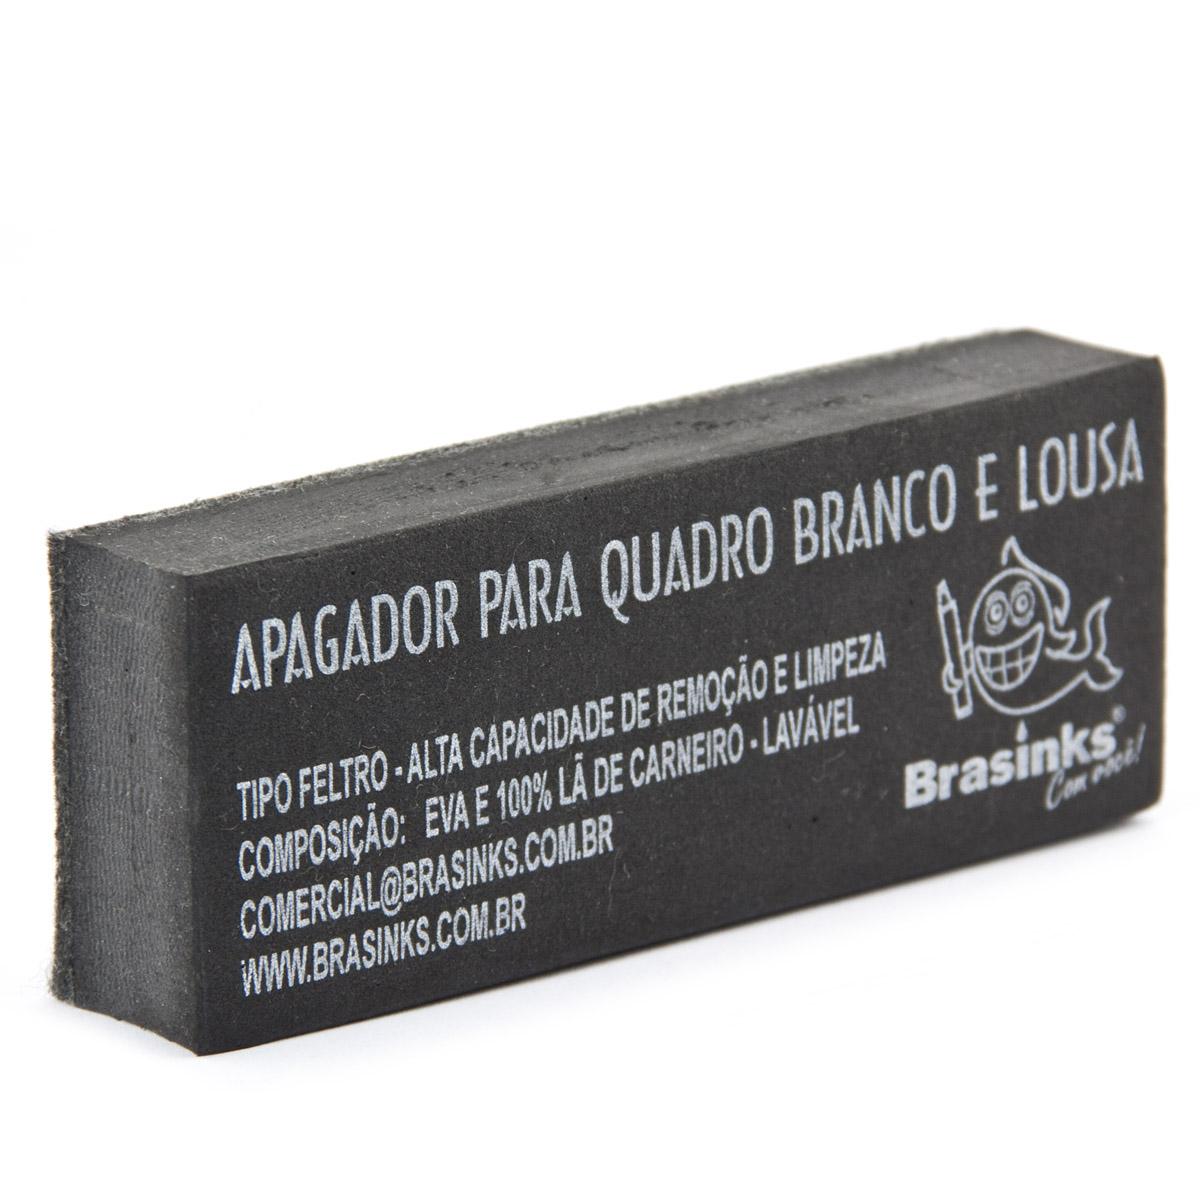 APAGADOR DE QUADRO BRANCO BRASINKS - LAVÁVEL